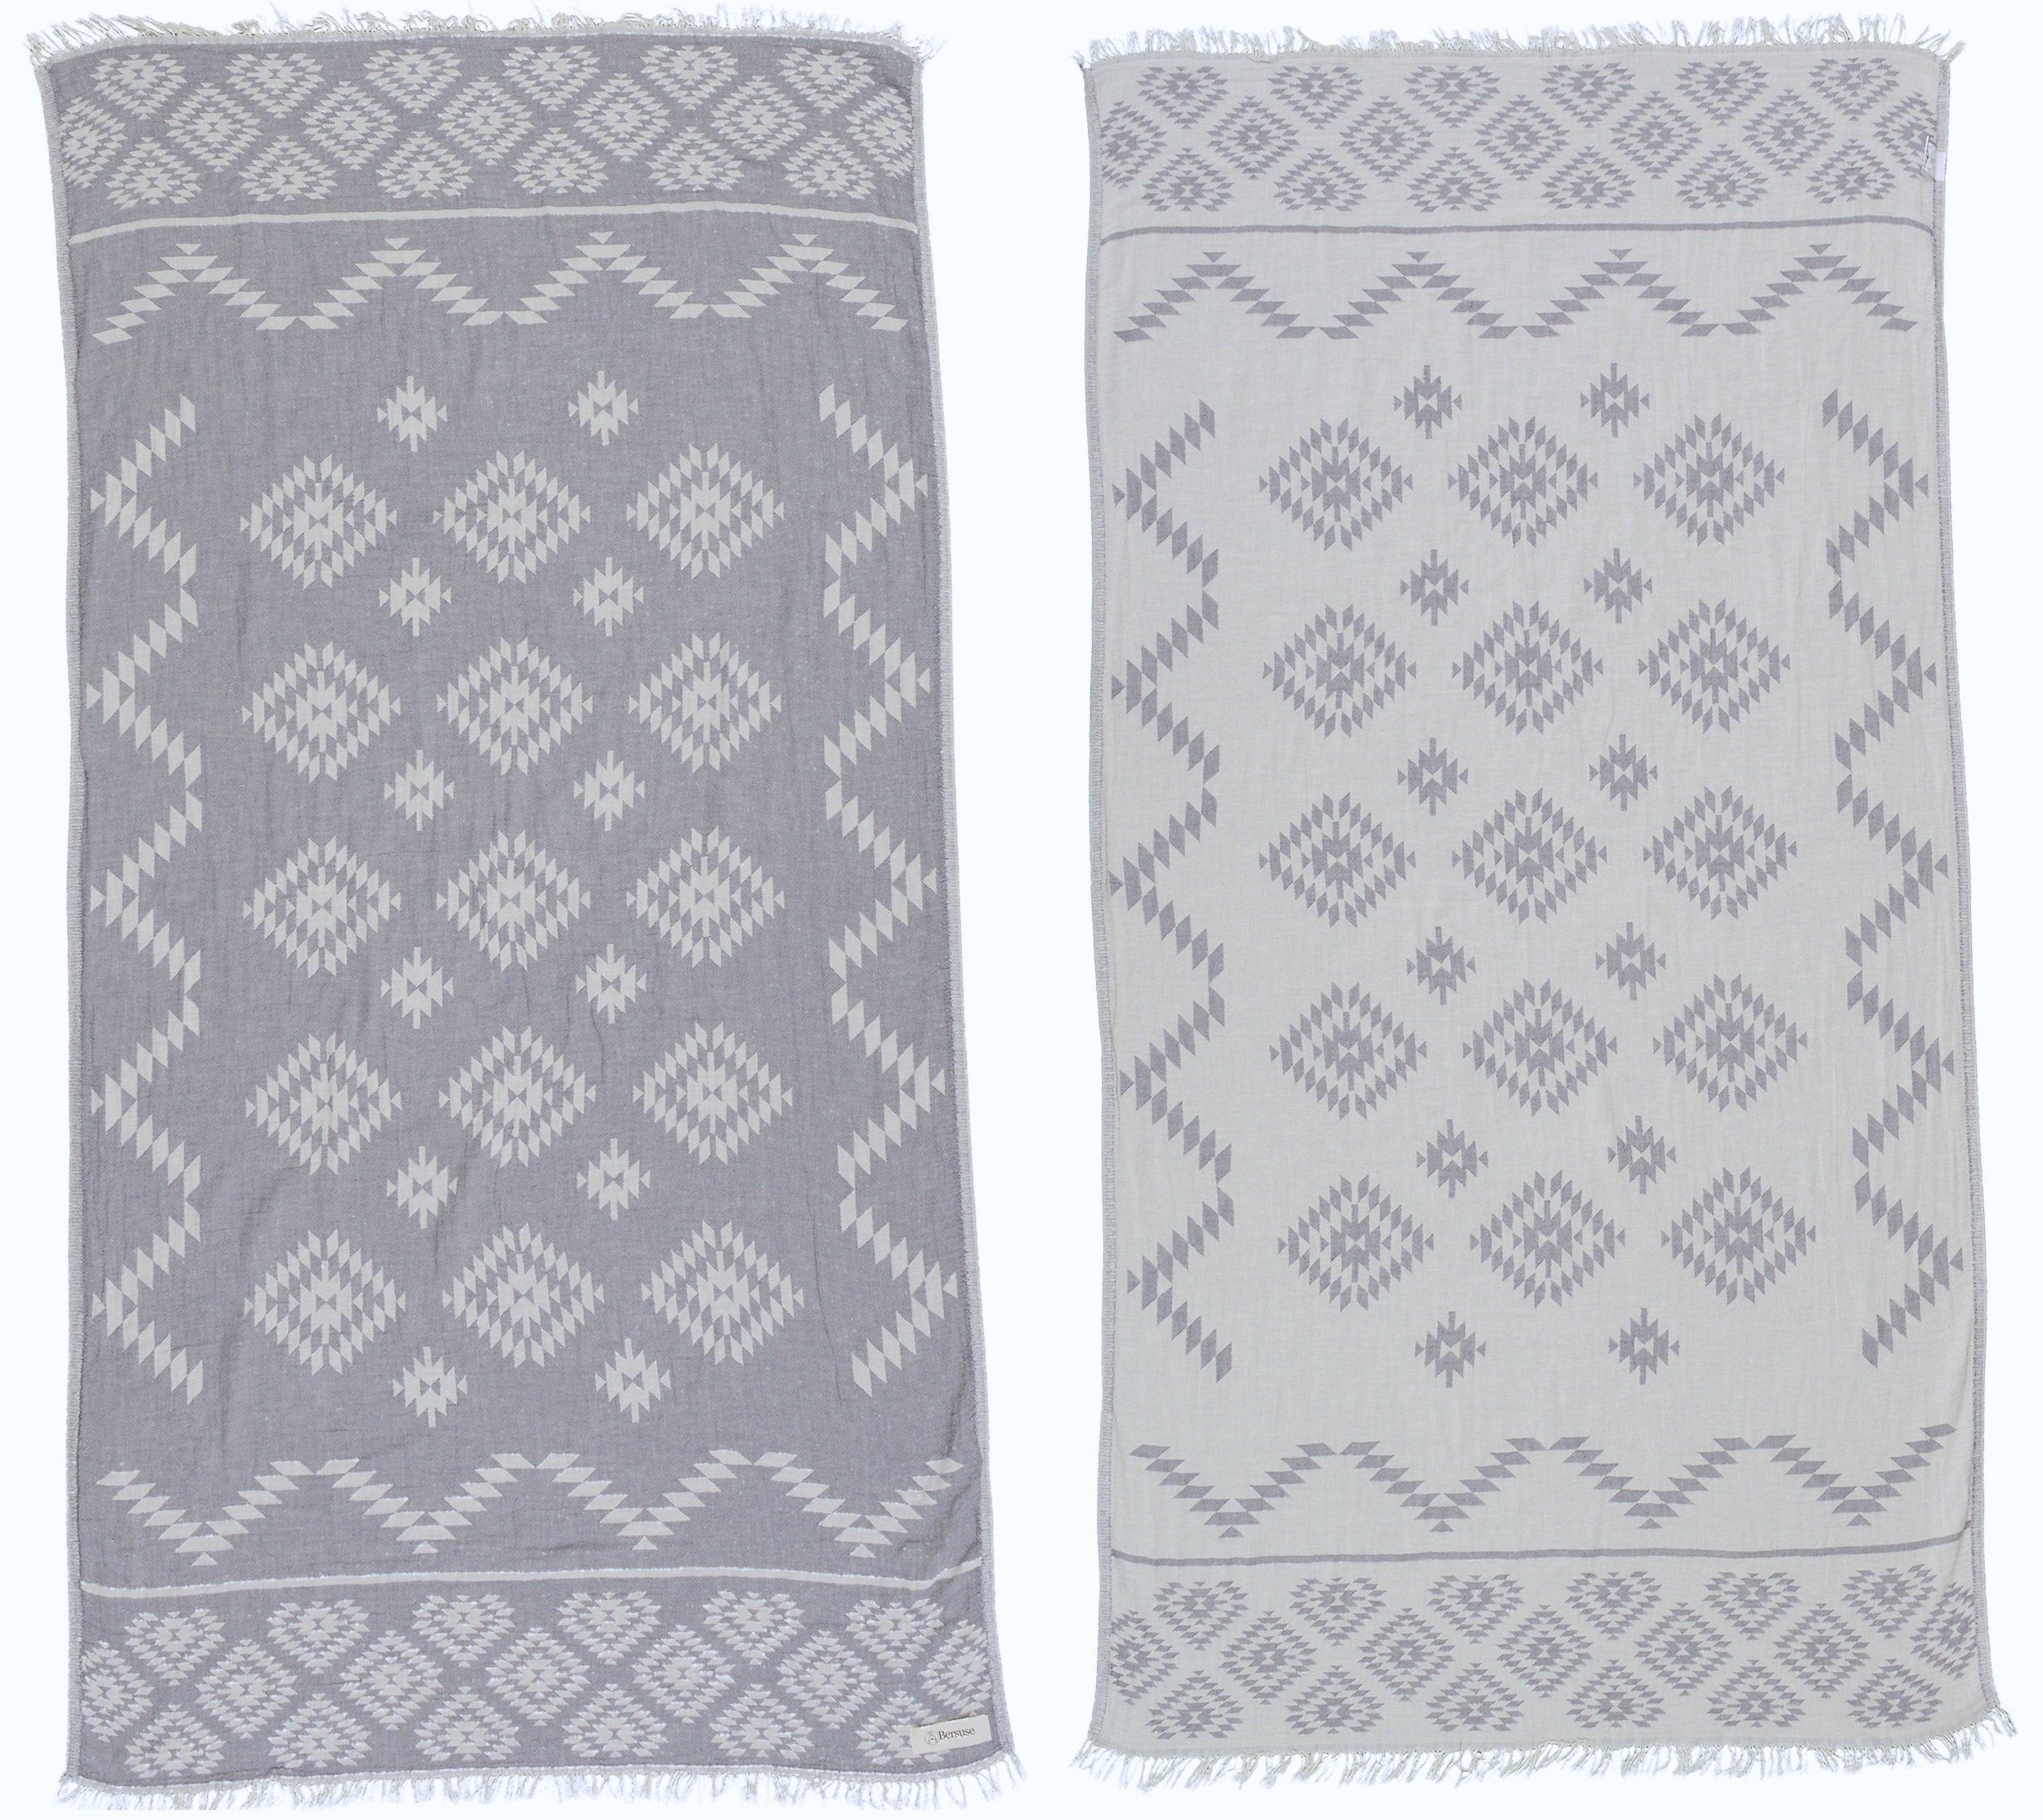 Bersuse 100% Cotton - Teotihuacan Turkish Towel - Bath Beach Fouta Peshtemal - Aztec Navajo Bohemian - Dual-Layer Handloom Pestemal - 39X71 Inches, Silver Grey (Set of 6)